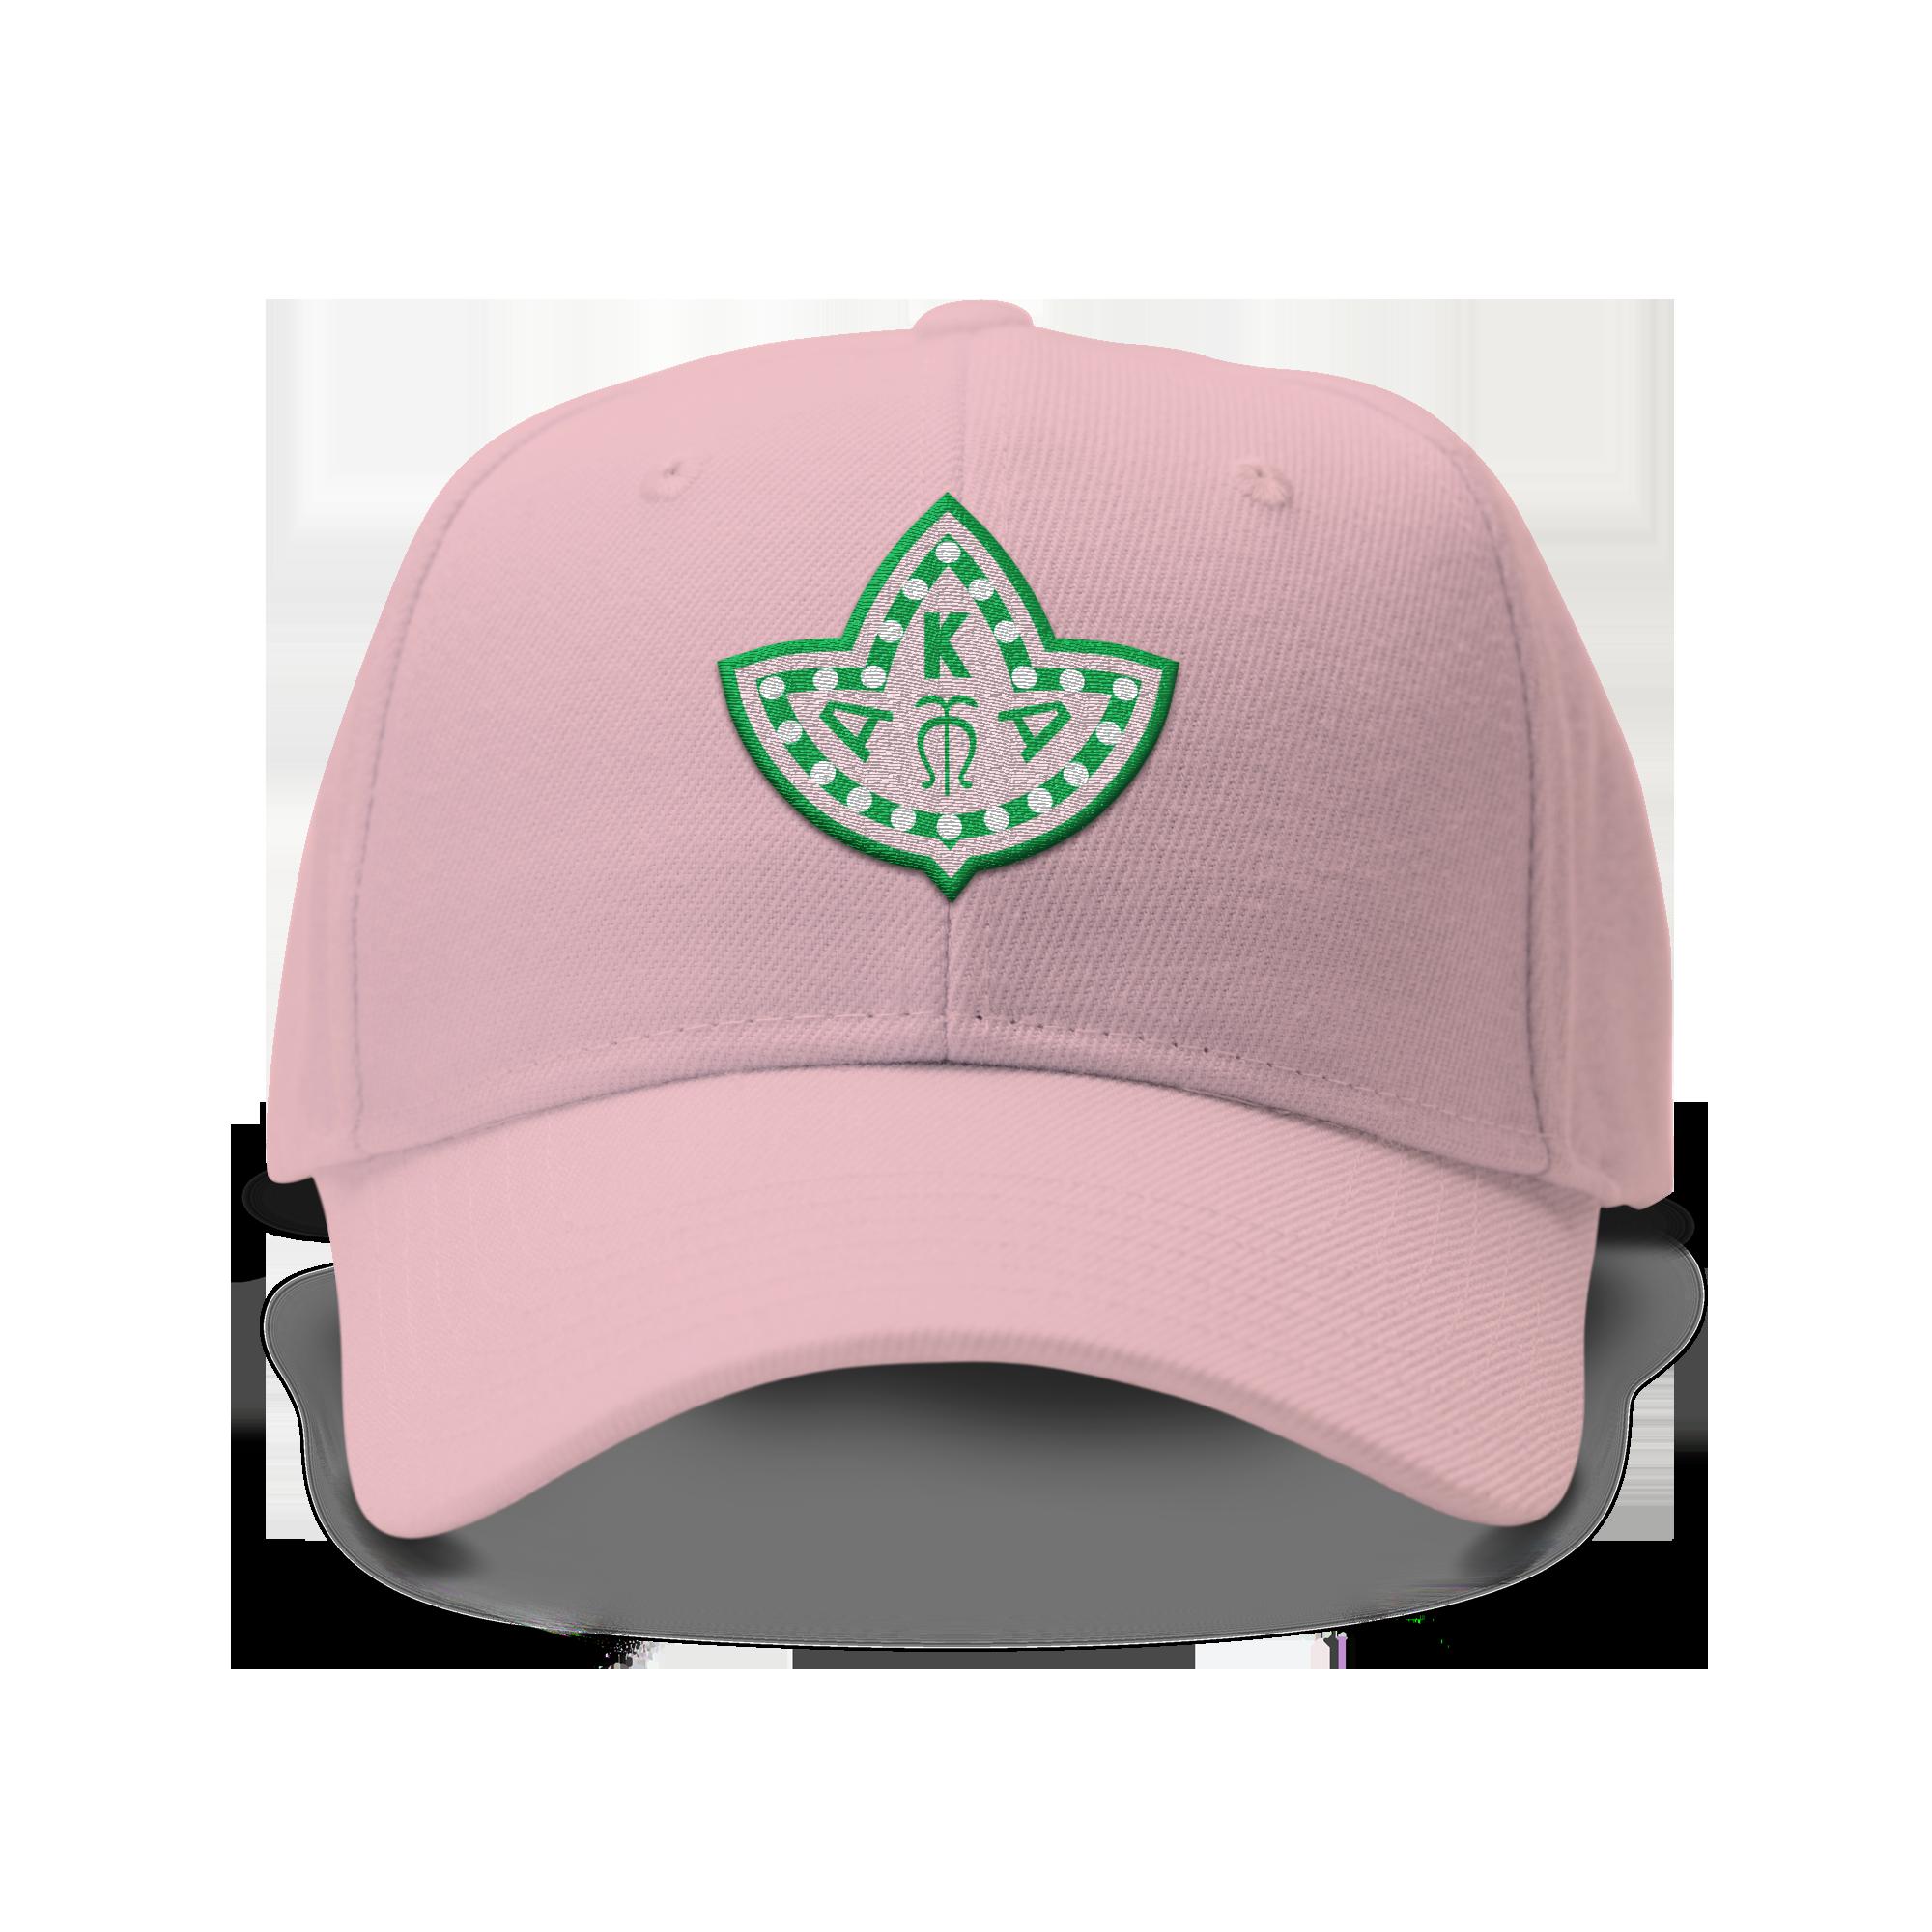 567f4d1dd4 Alpha Kappa Alpha Embroidered Ivy Leaf Dad Hat (Pink) | Aka para ...